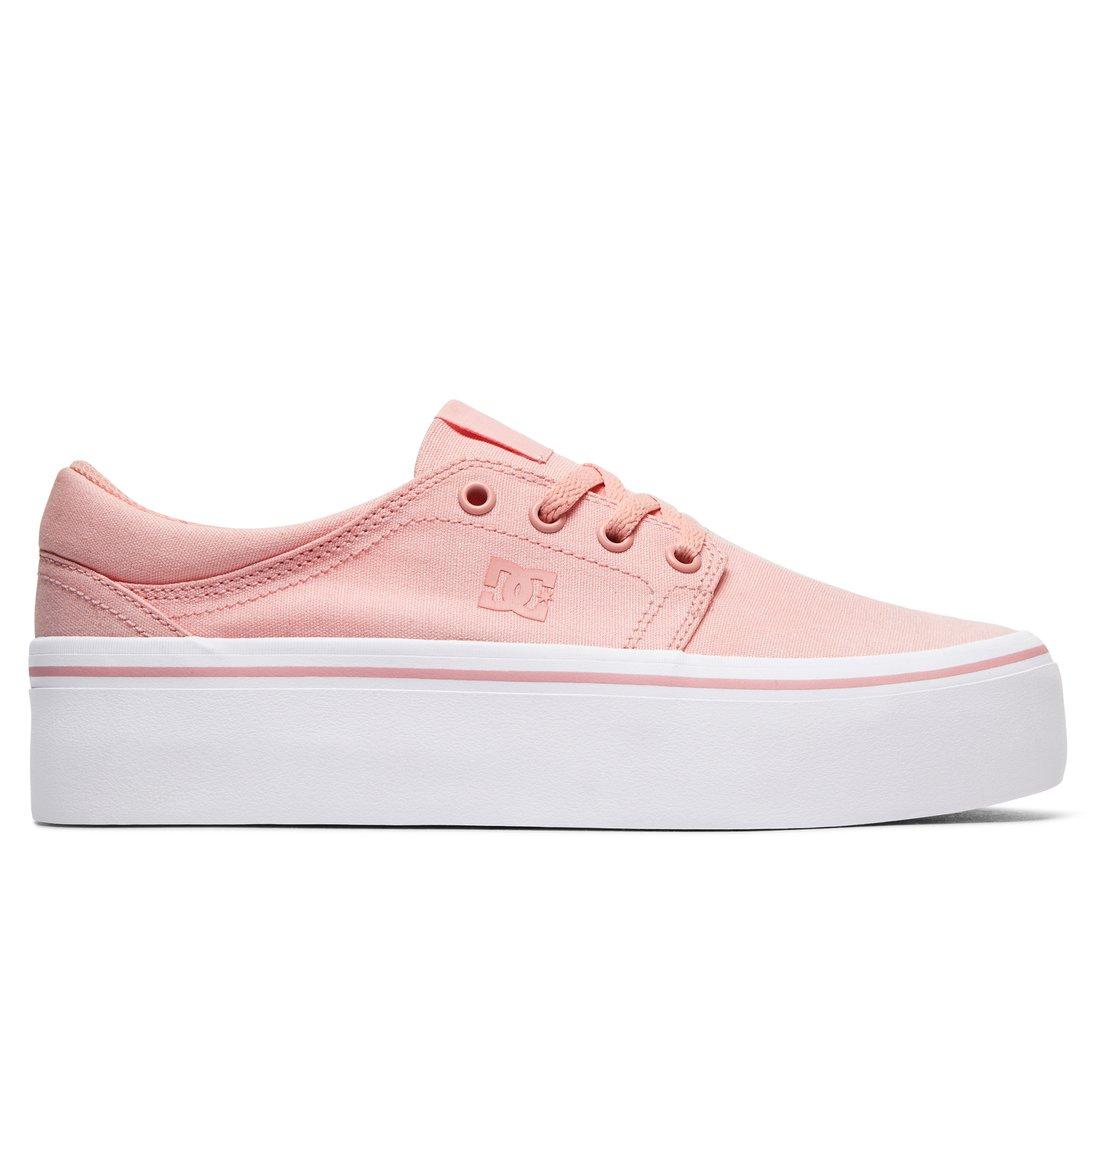 Shoes™ For Details Shoes Dc Tx Trase Platform About Women Adjs300184 Flatform mNnw0Ov8